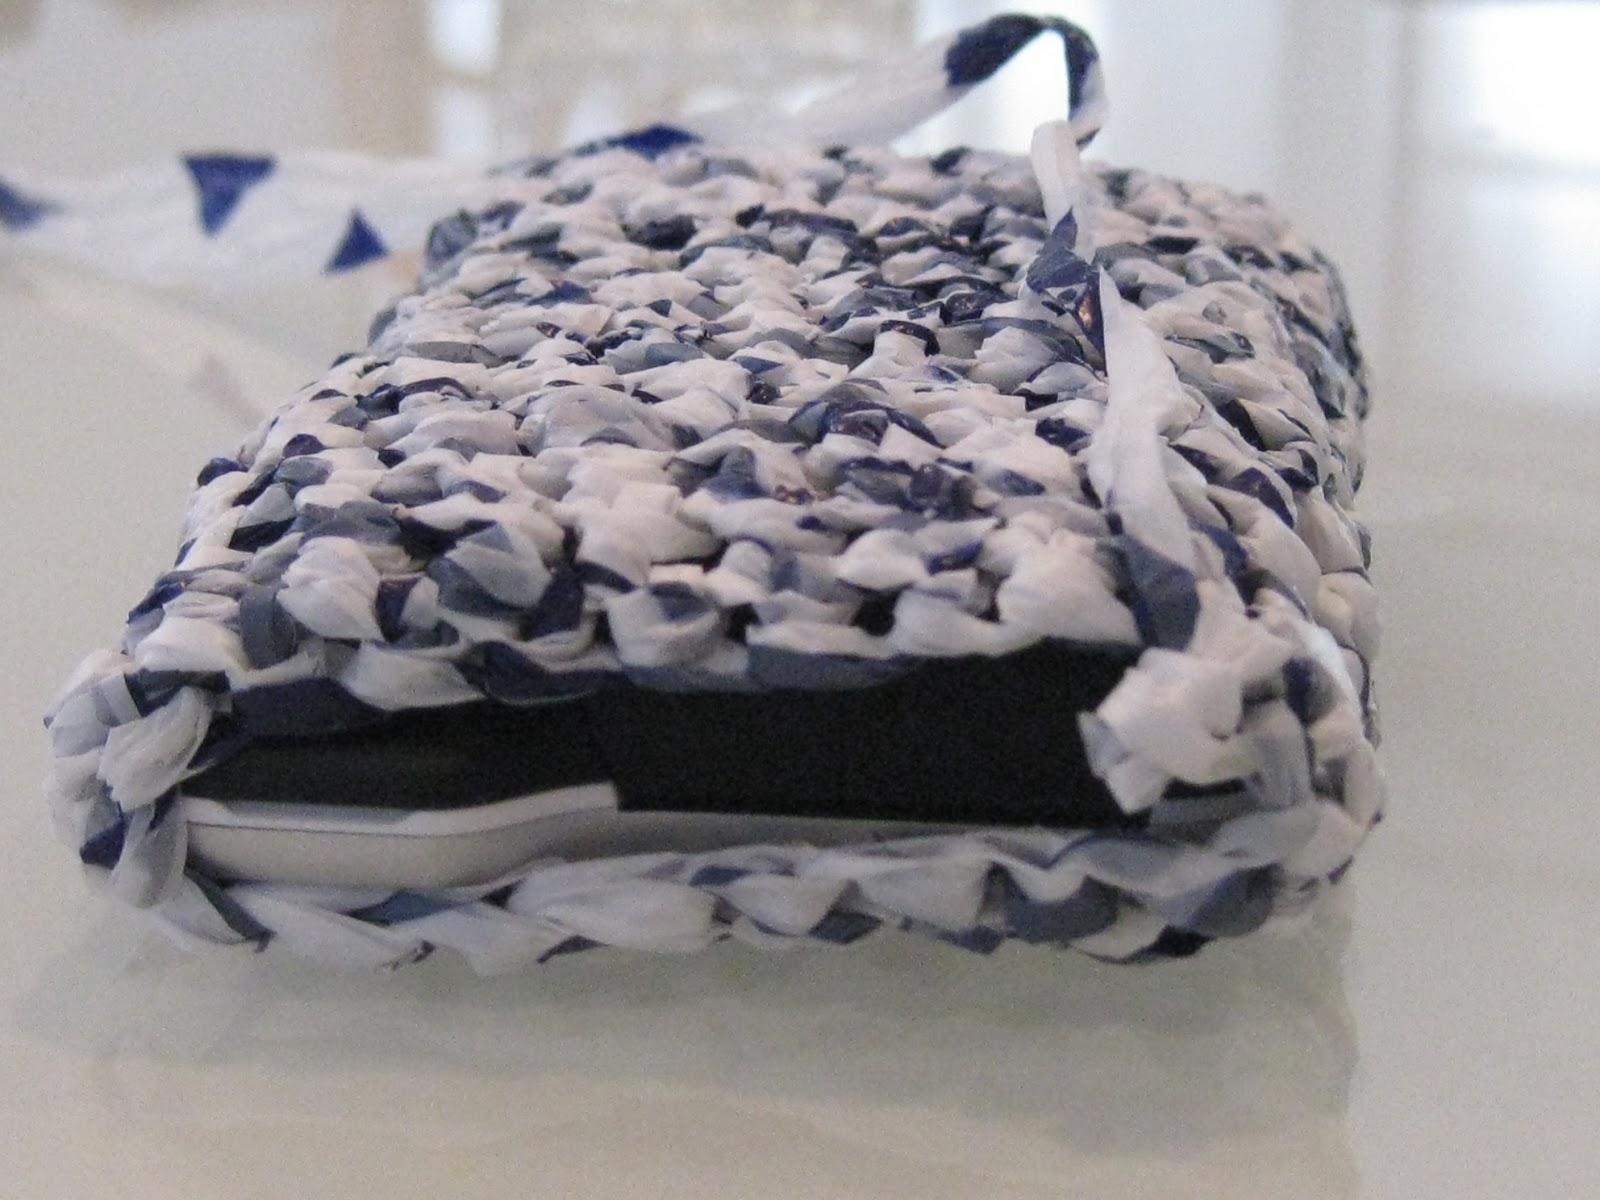 littlest crafts haekeln mit plastiktueten. Black Bedroom Furniture Sets. Home Design Ideas